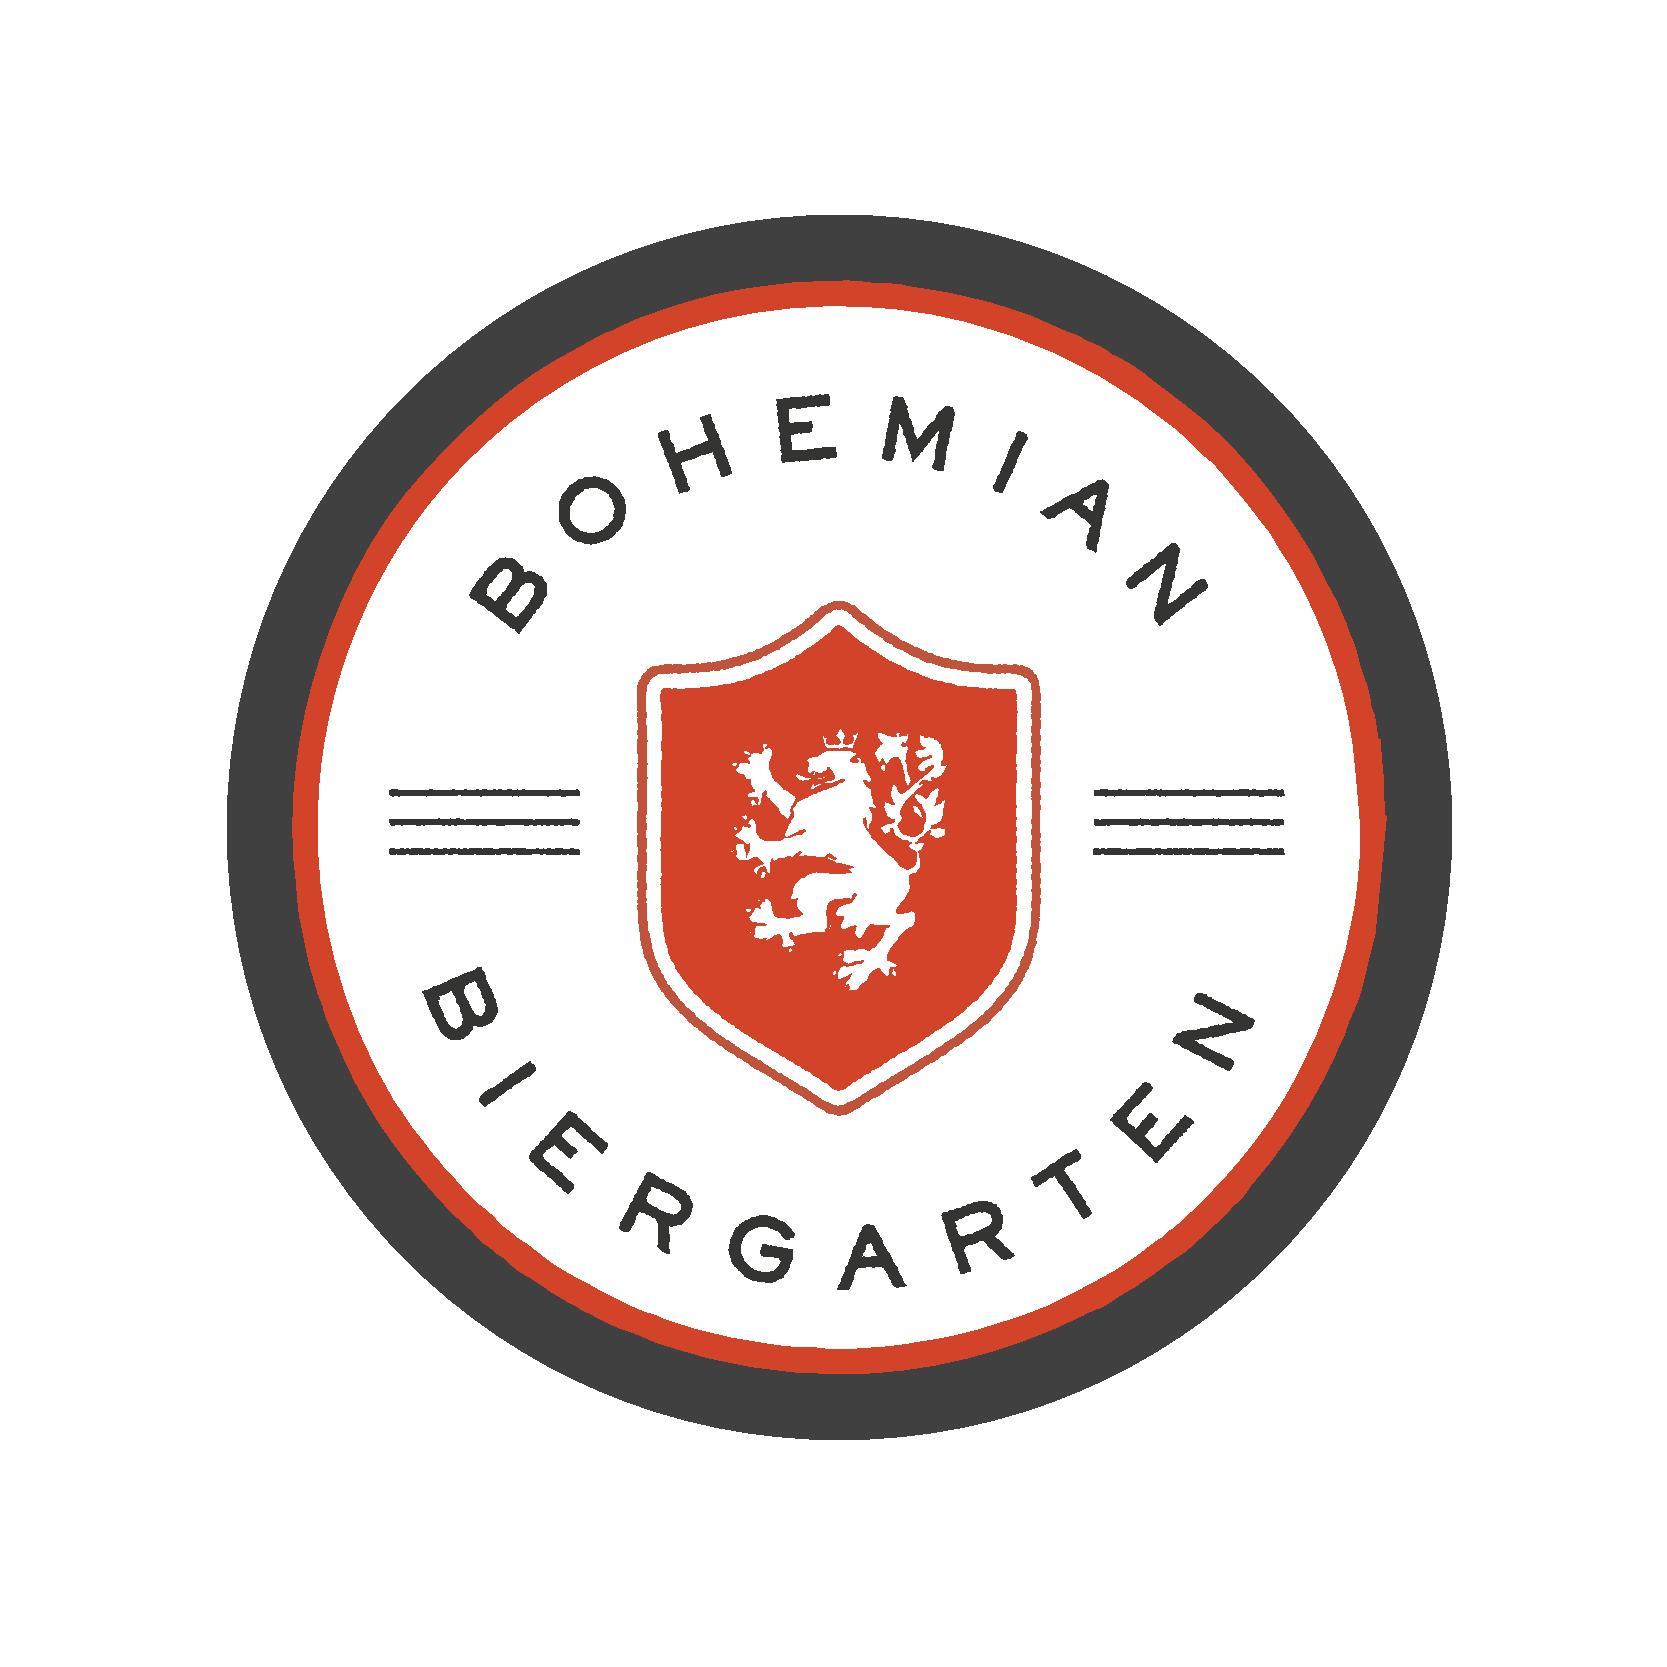 Bohemian Biergarten